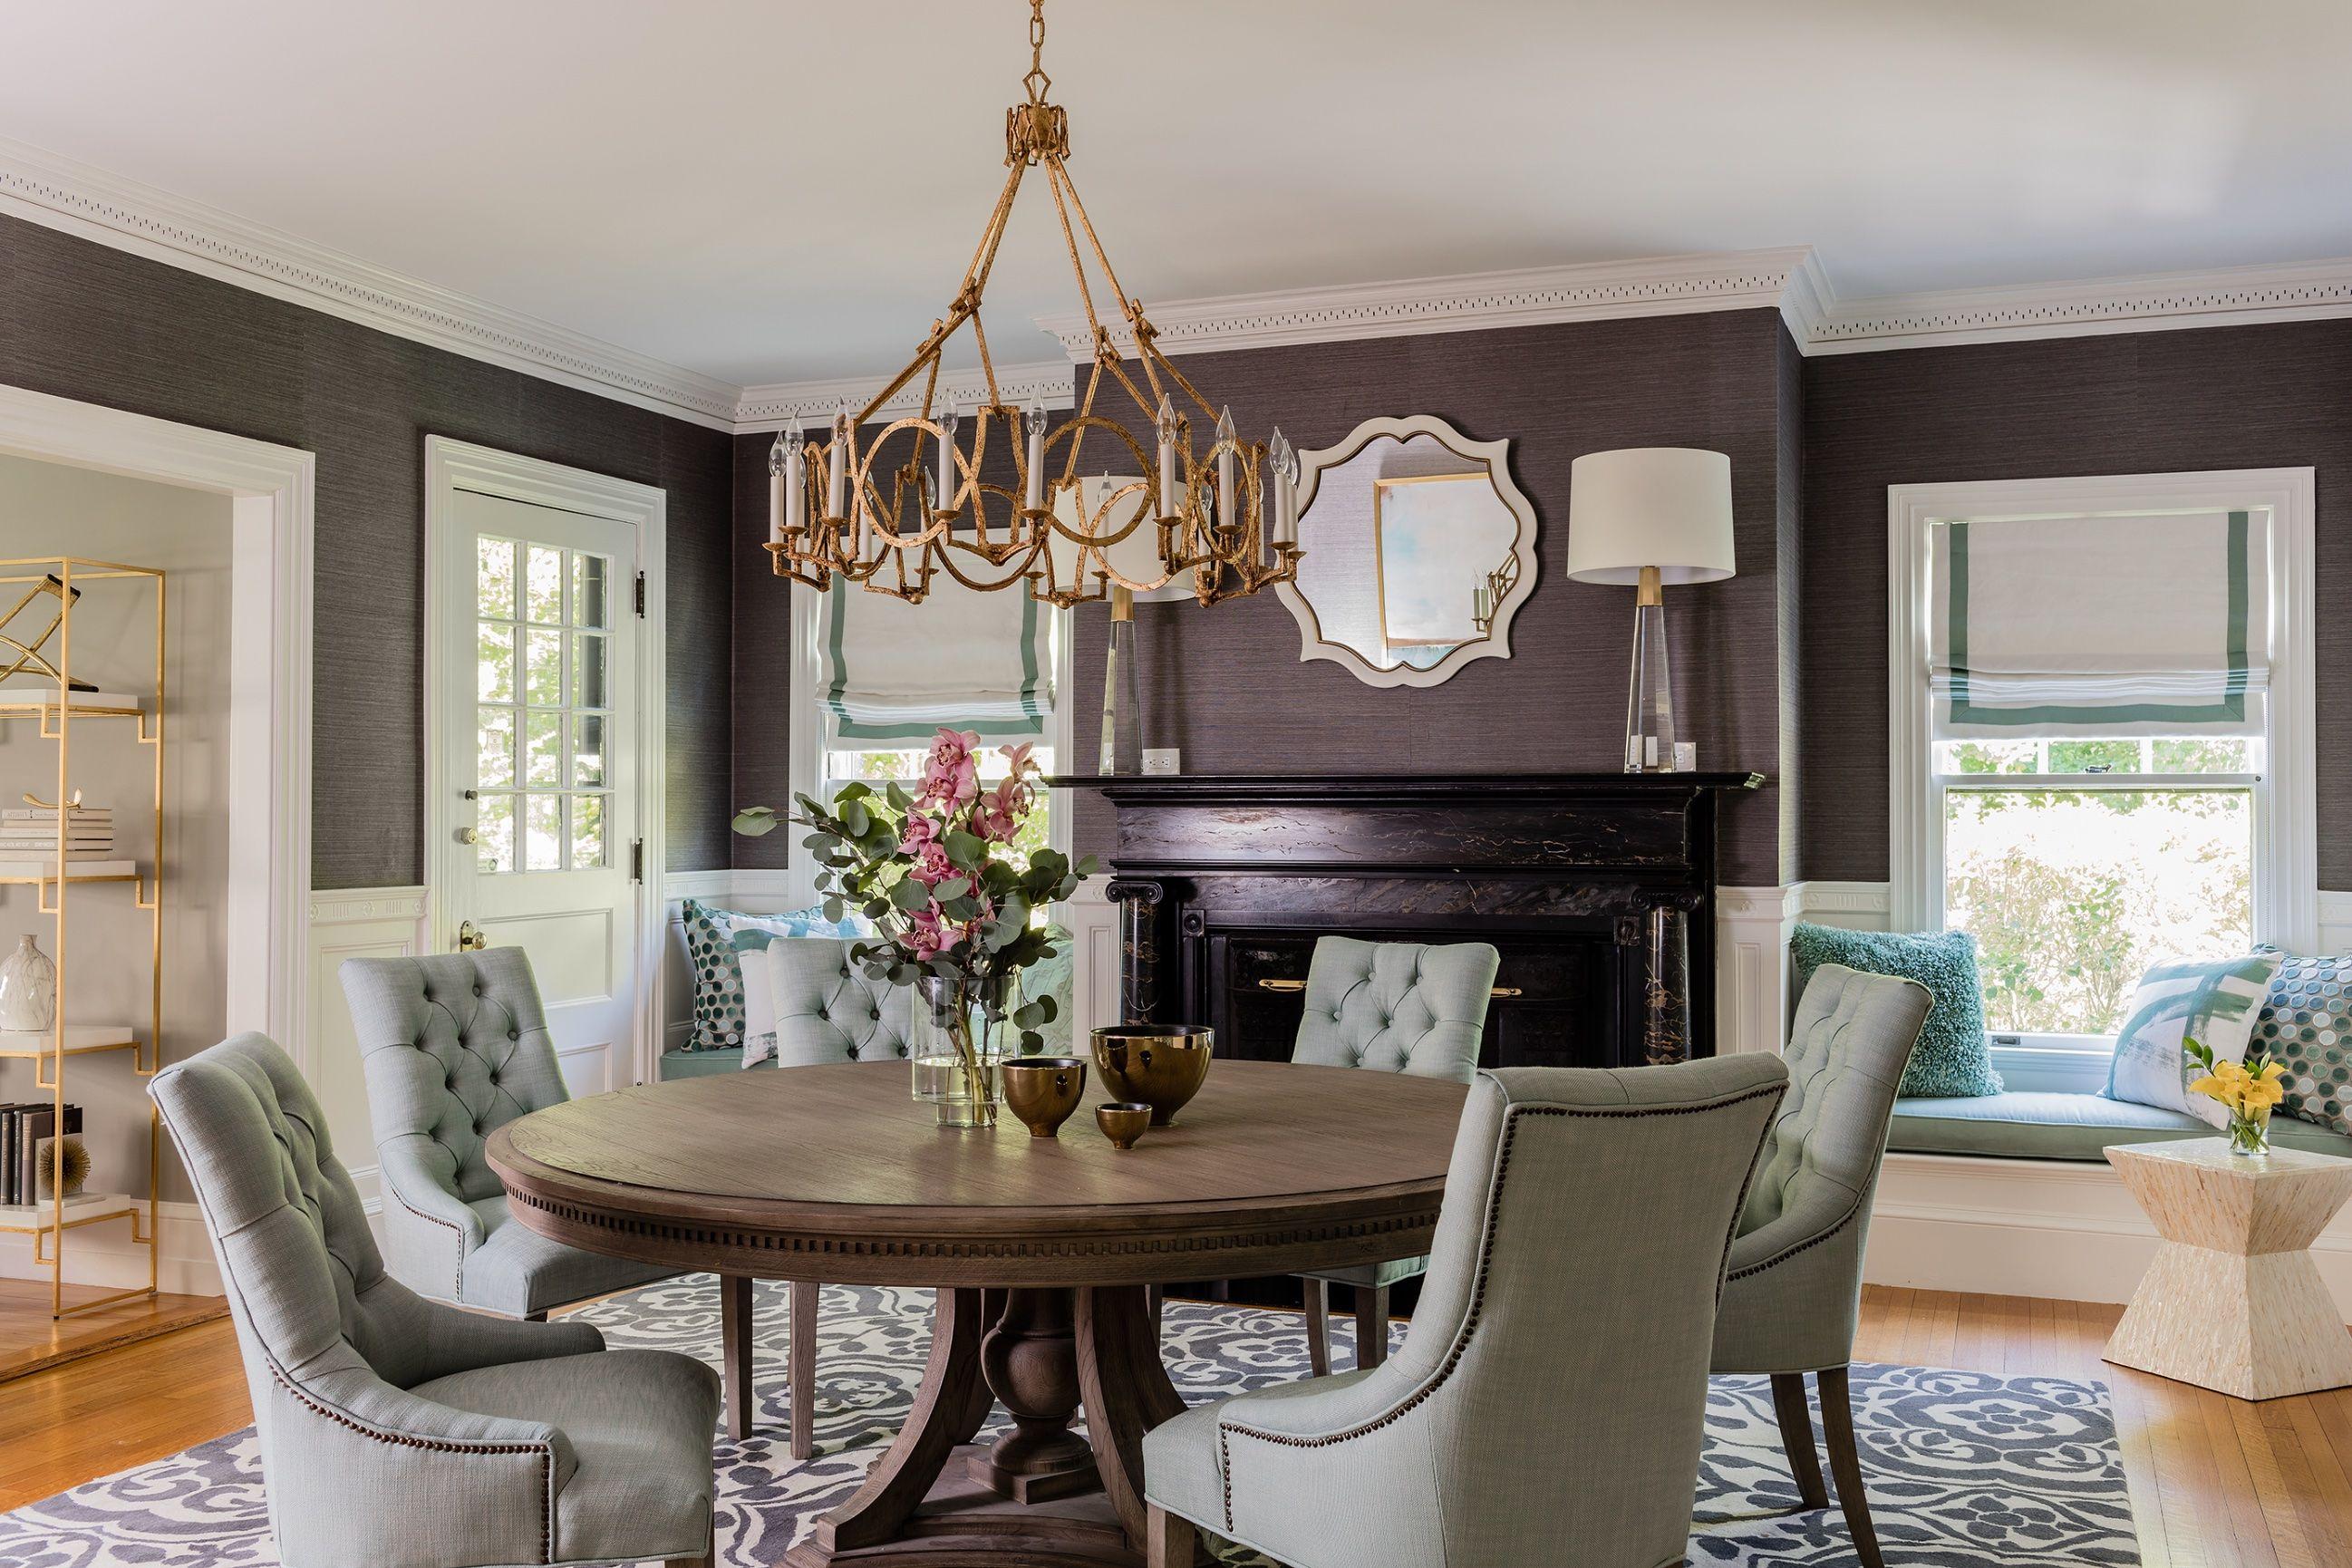 LIVEABLE LUXE Bryant Park Designs interiordesign